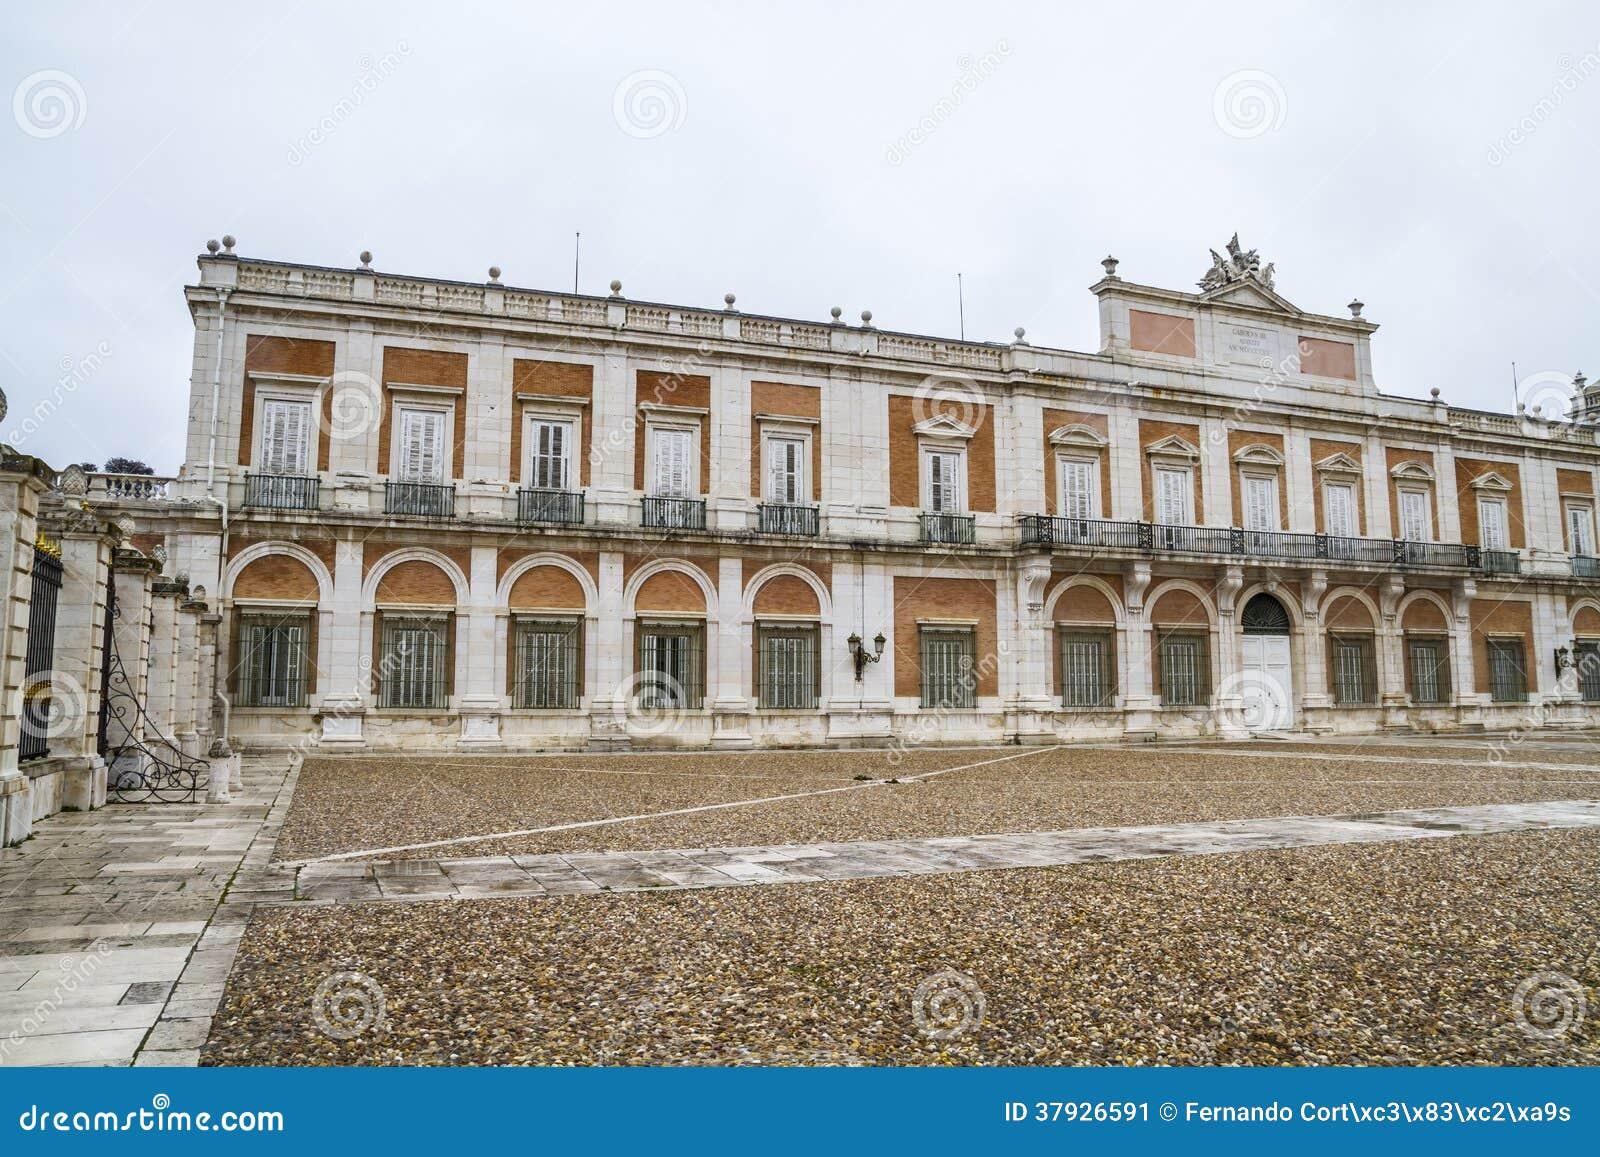 Façade principale. Le palais d Aranjuez, Madrid, héritage de Spain.World se reposent